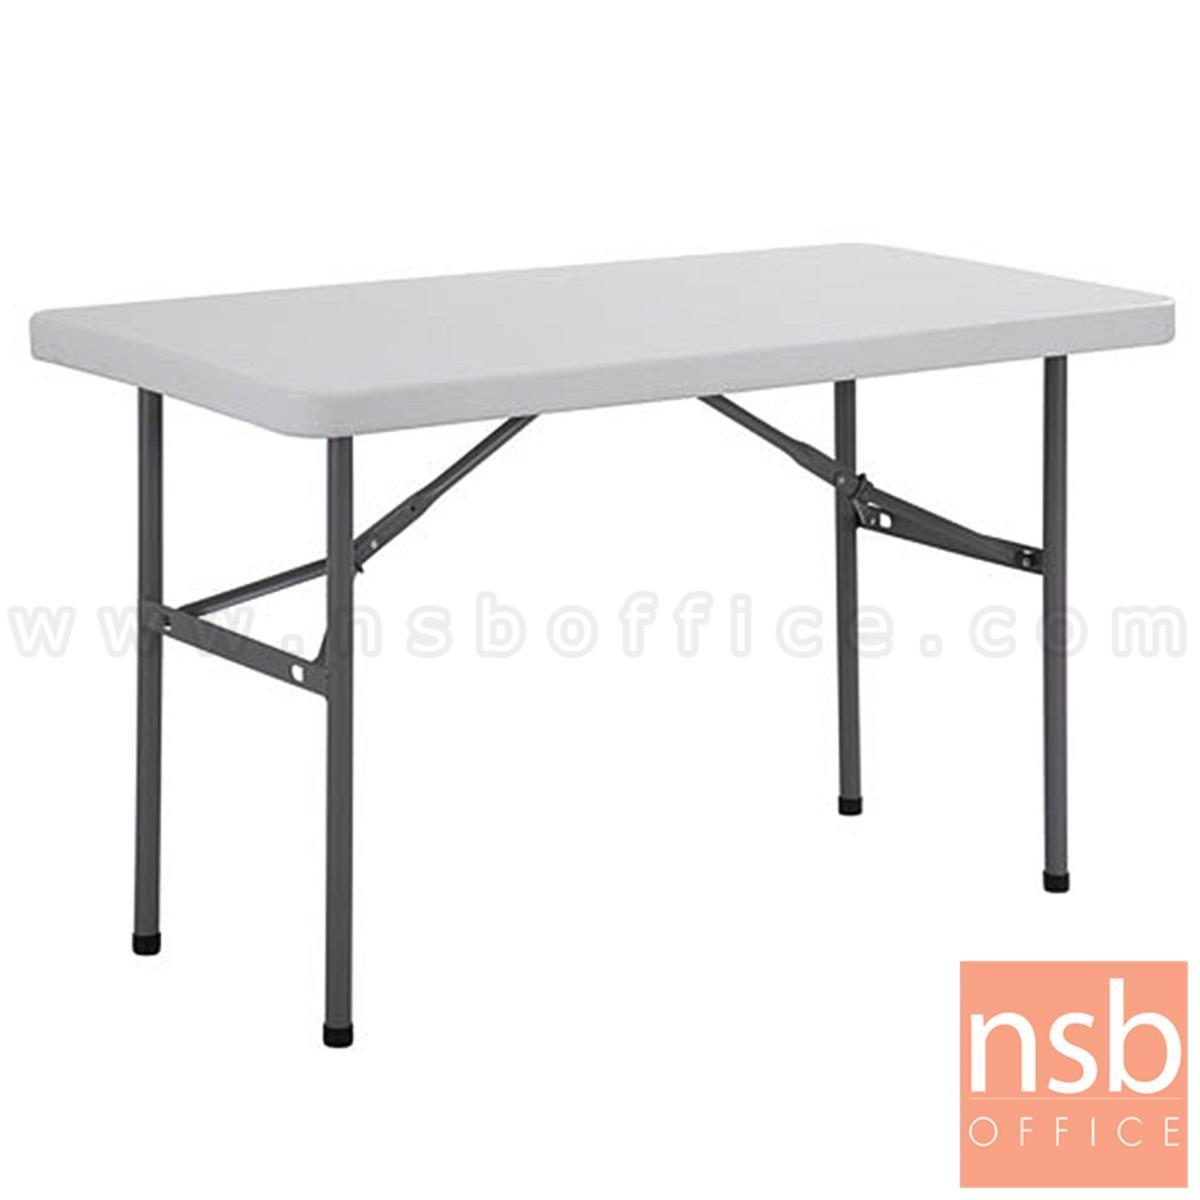 A19A021:โต๊ะพับหน้าพลาสติก รุ่น Colossal (โคลอซซอล) ขนาด 122.2W, 150W, 180W cm.  ขาอีพ็อกซี่เกล็ดเงิน